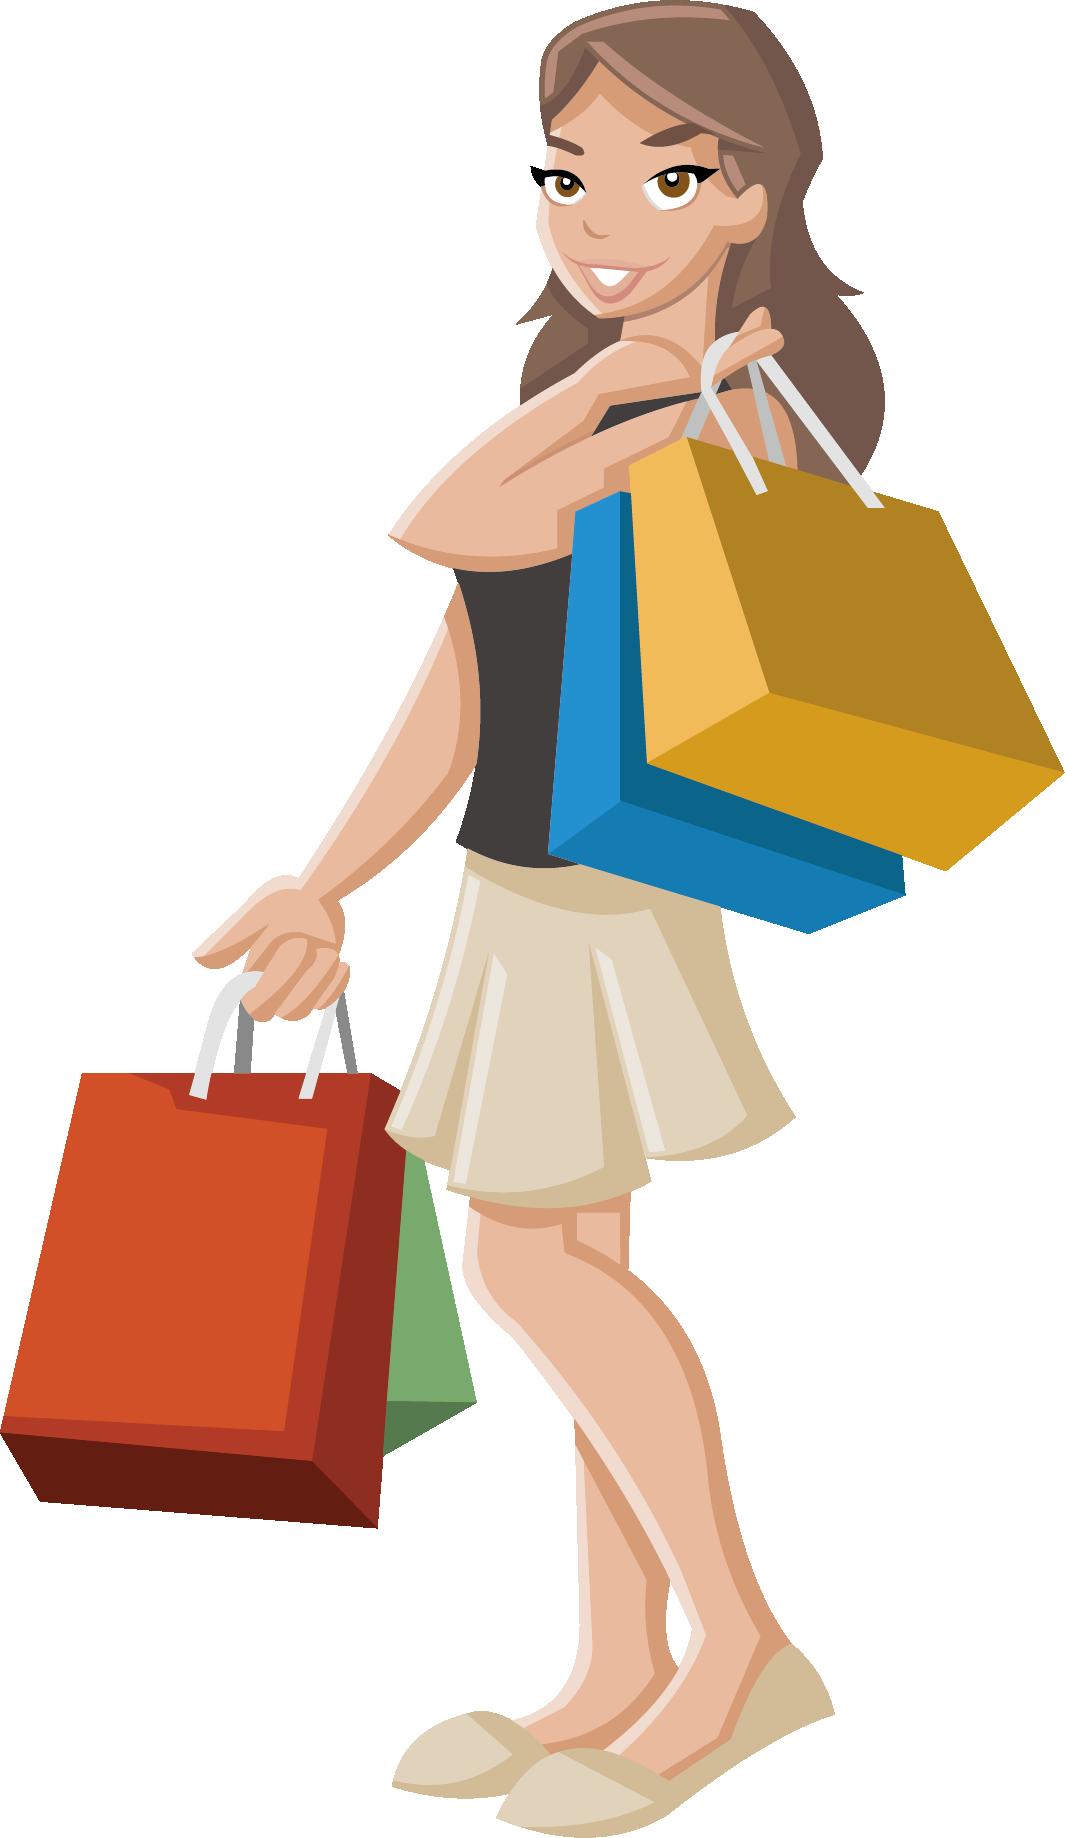 Mall clipart personal shopper. Cartoon stick figure drawing